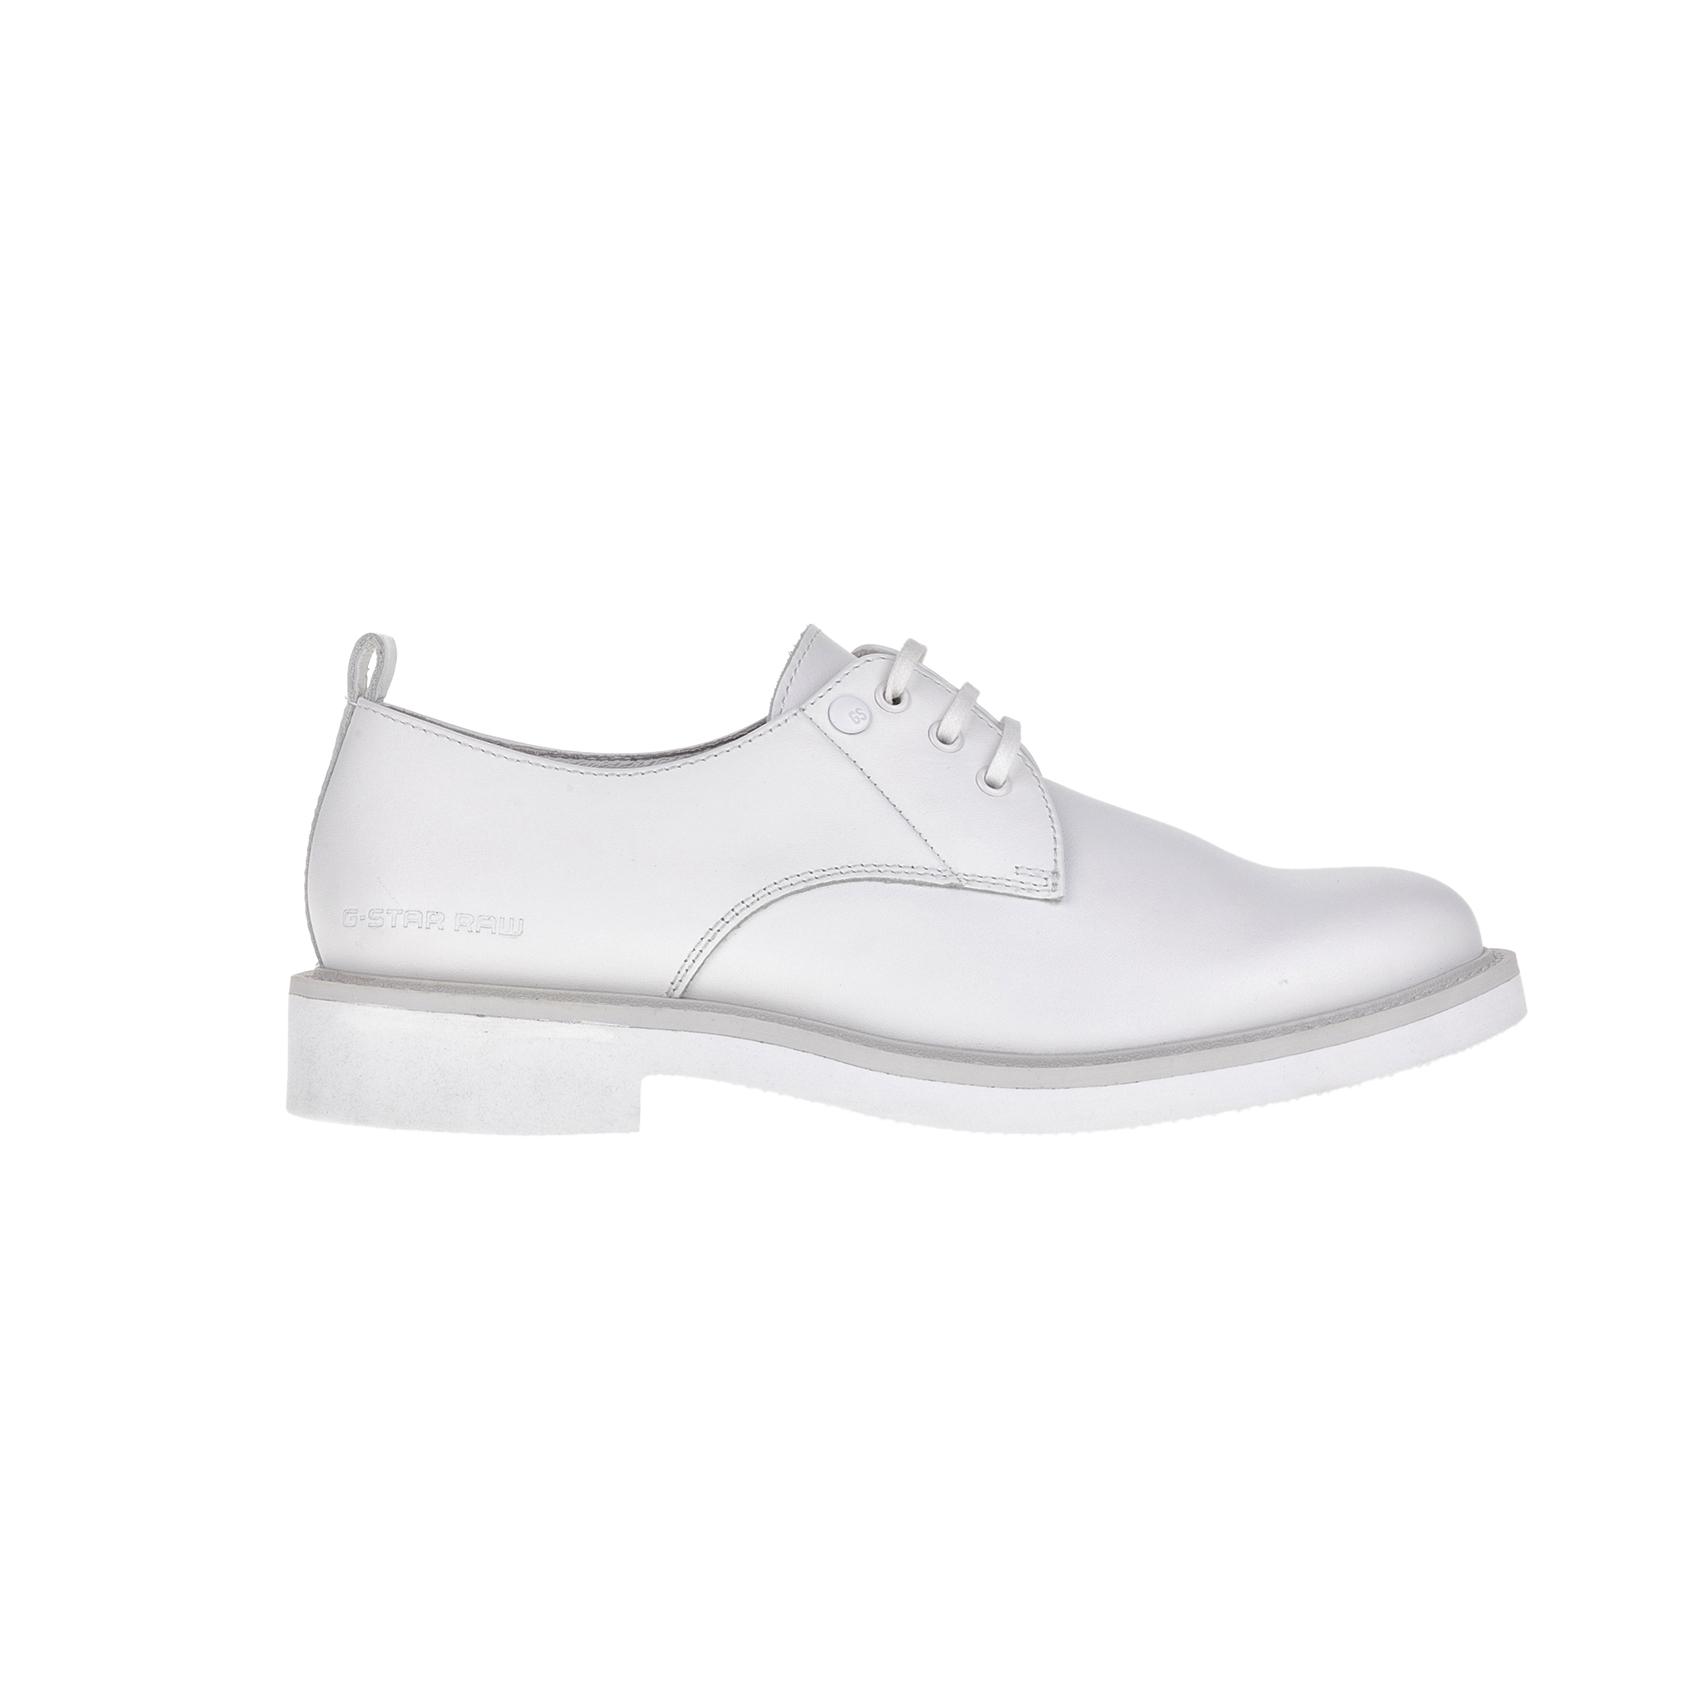 G-STAR RAW – Γυναικεία παπούτσια G-STAR RAW MORTON MONO λευκά